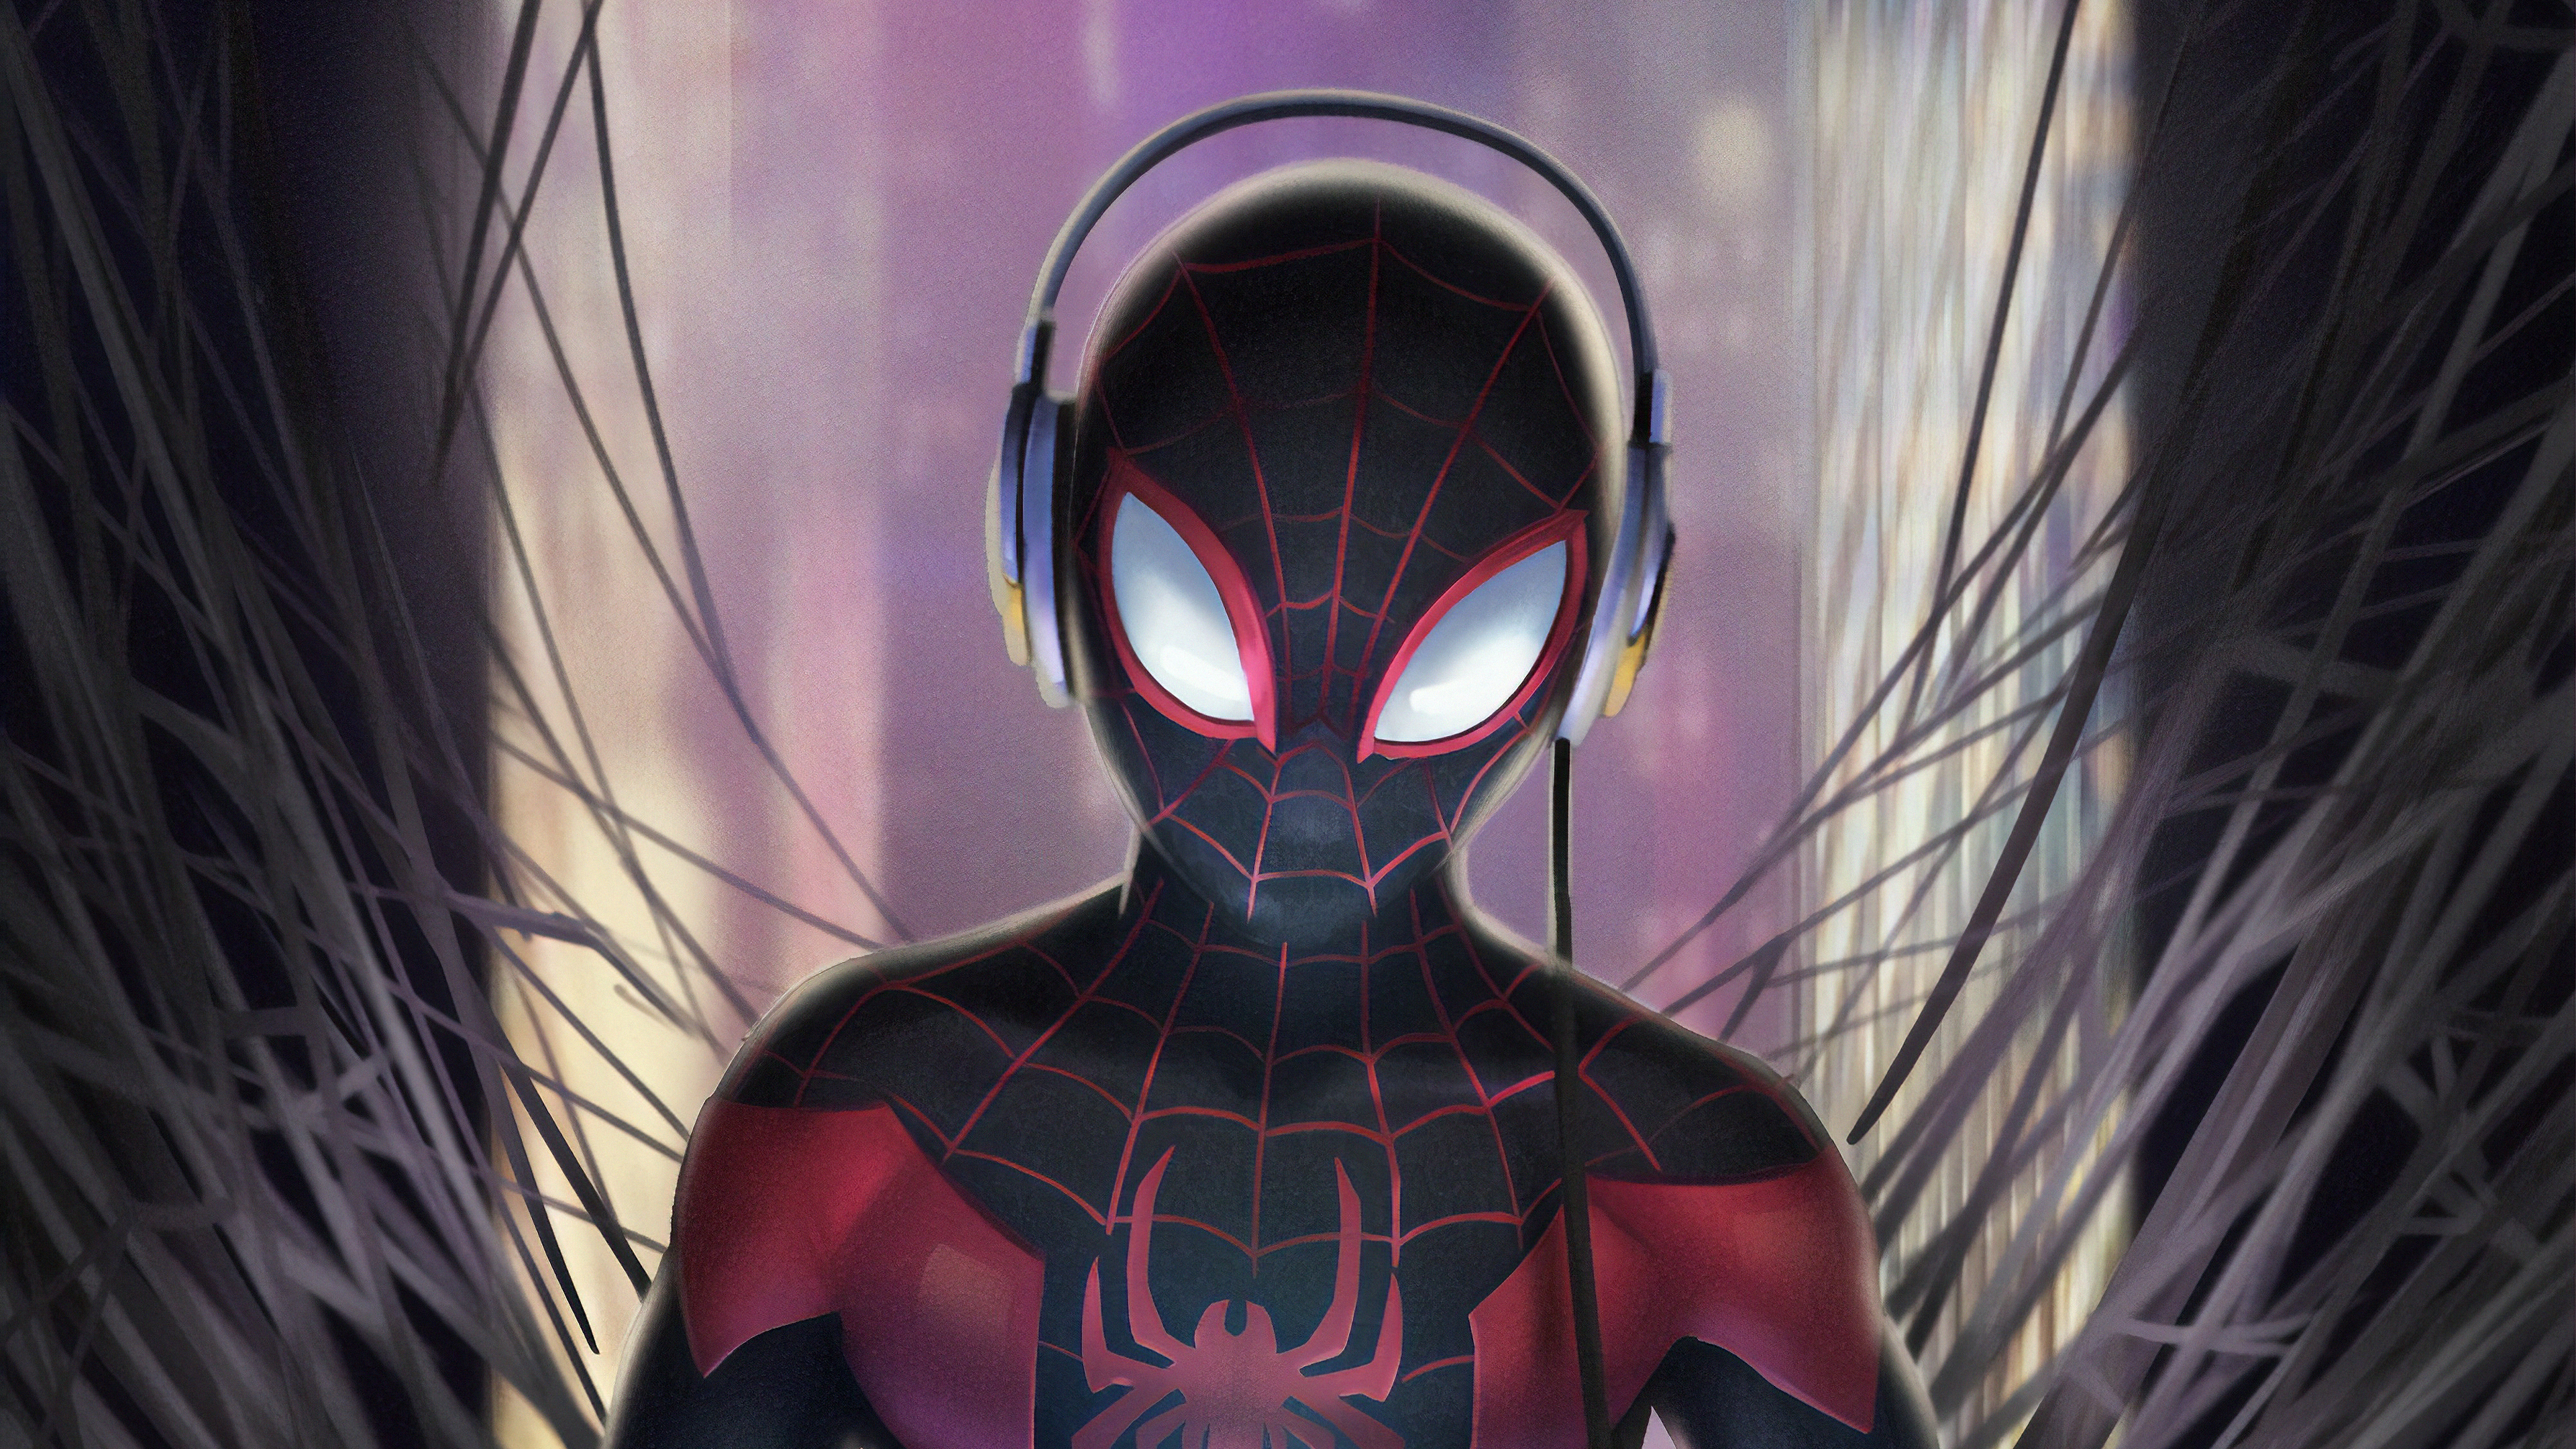 miles listening music 1570394802 - Miles Listening Music - superheroes wallpapers, spiderman wallpapers, hd-wallpapers, digital art wallpapers, artwork wallpapers, arstation wallpapers